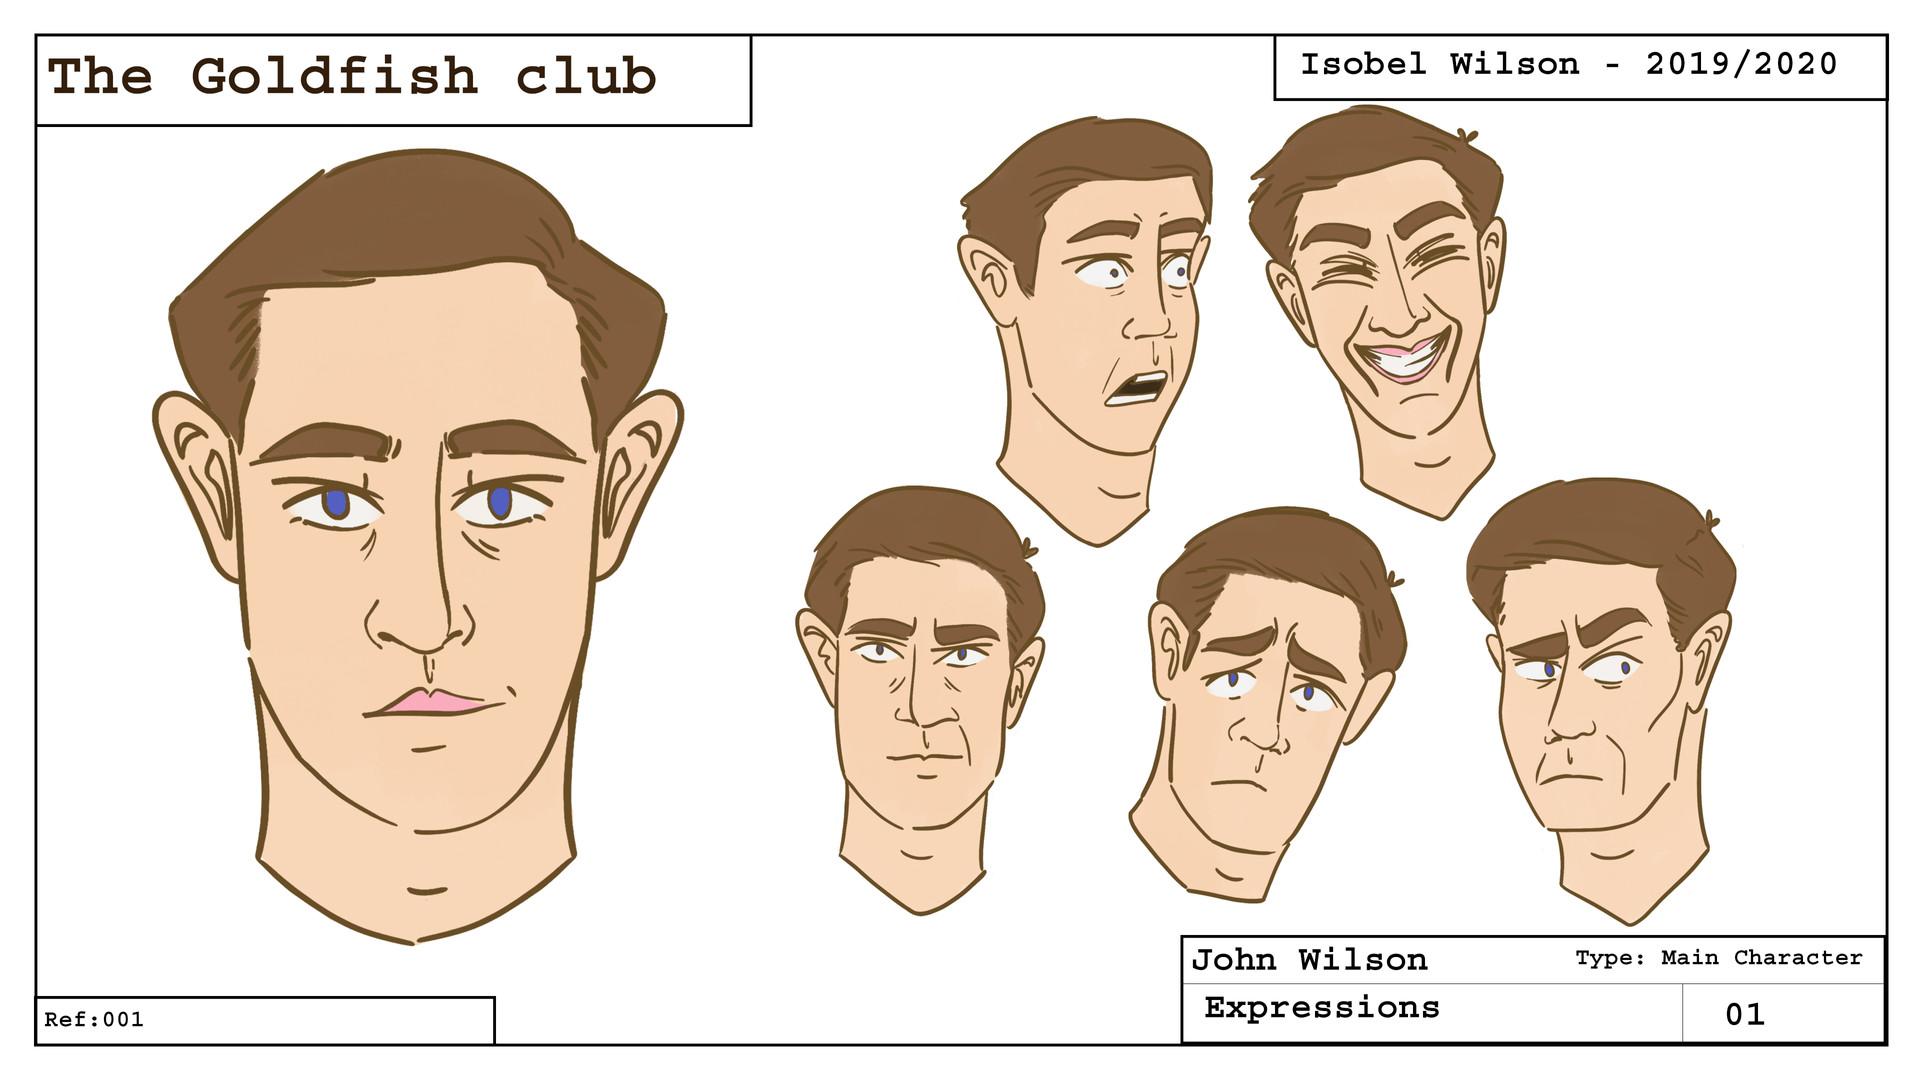 John - Character expressions